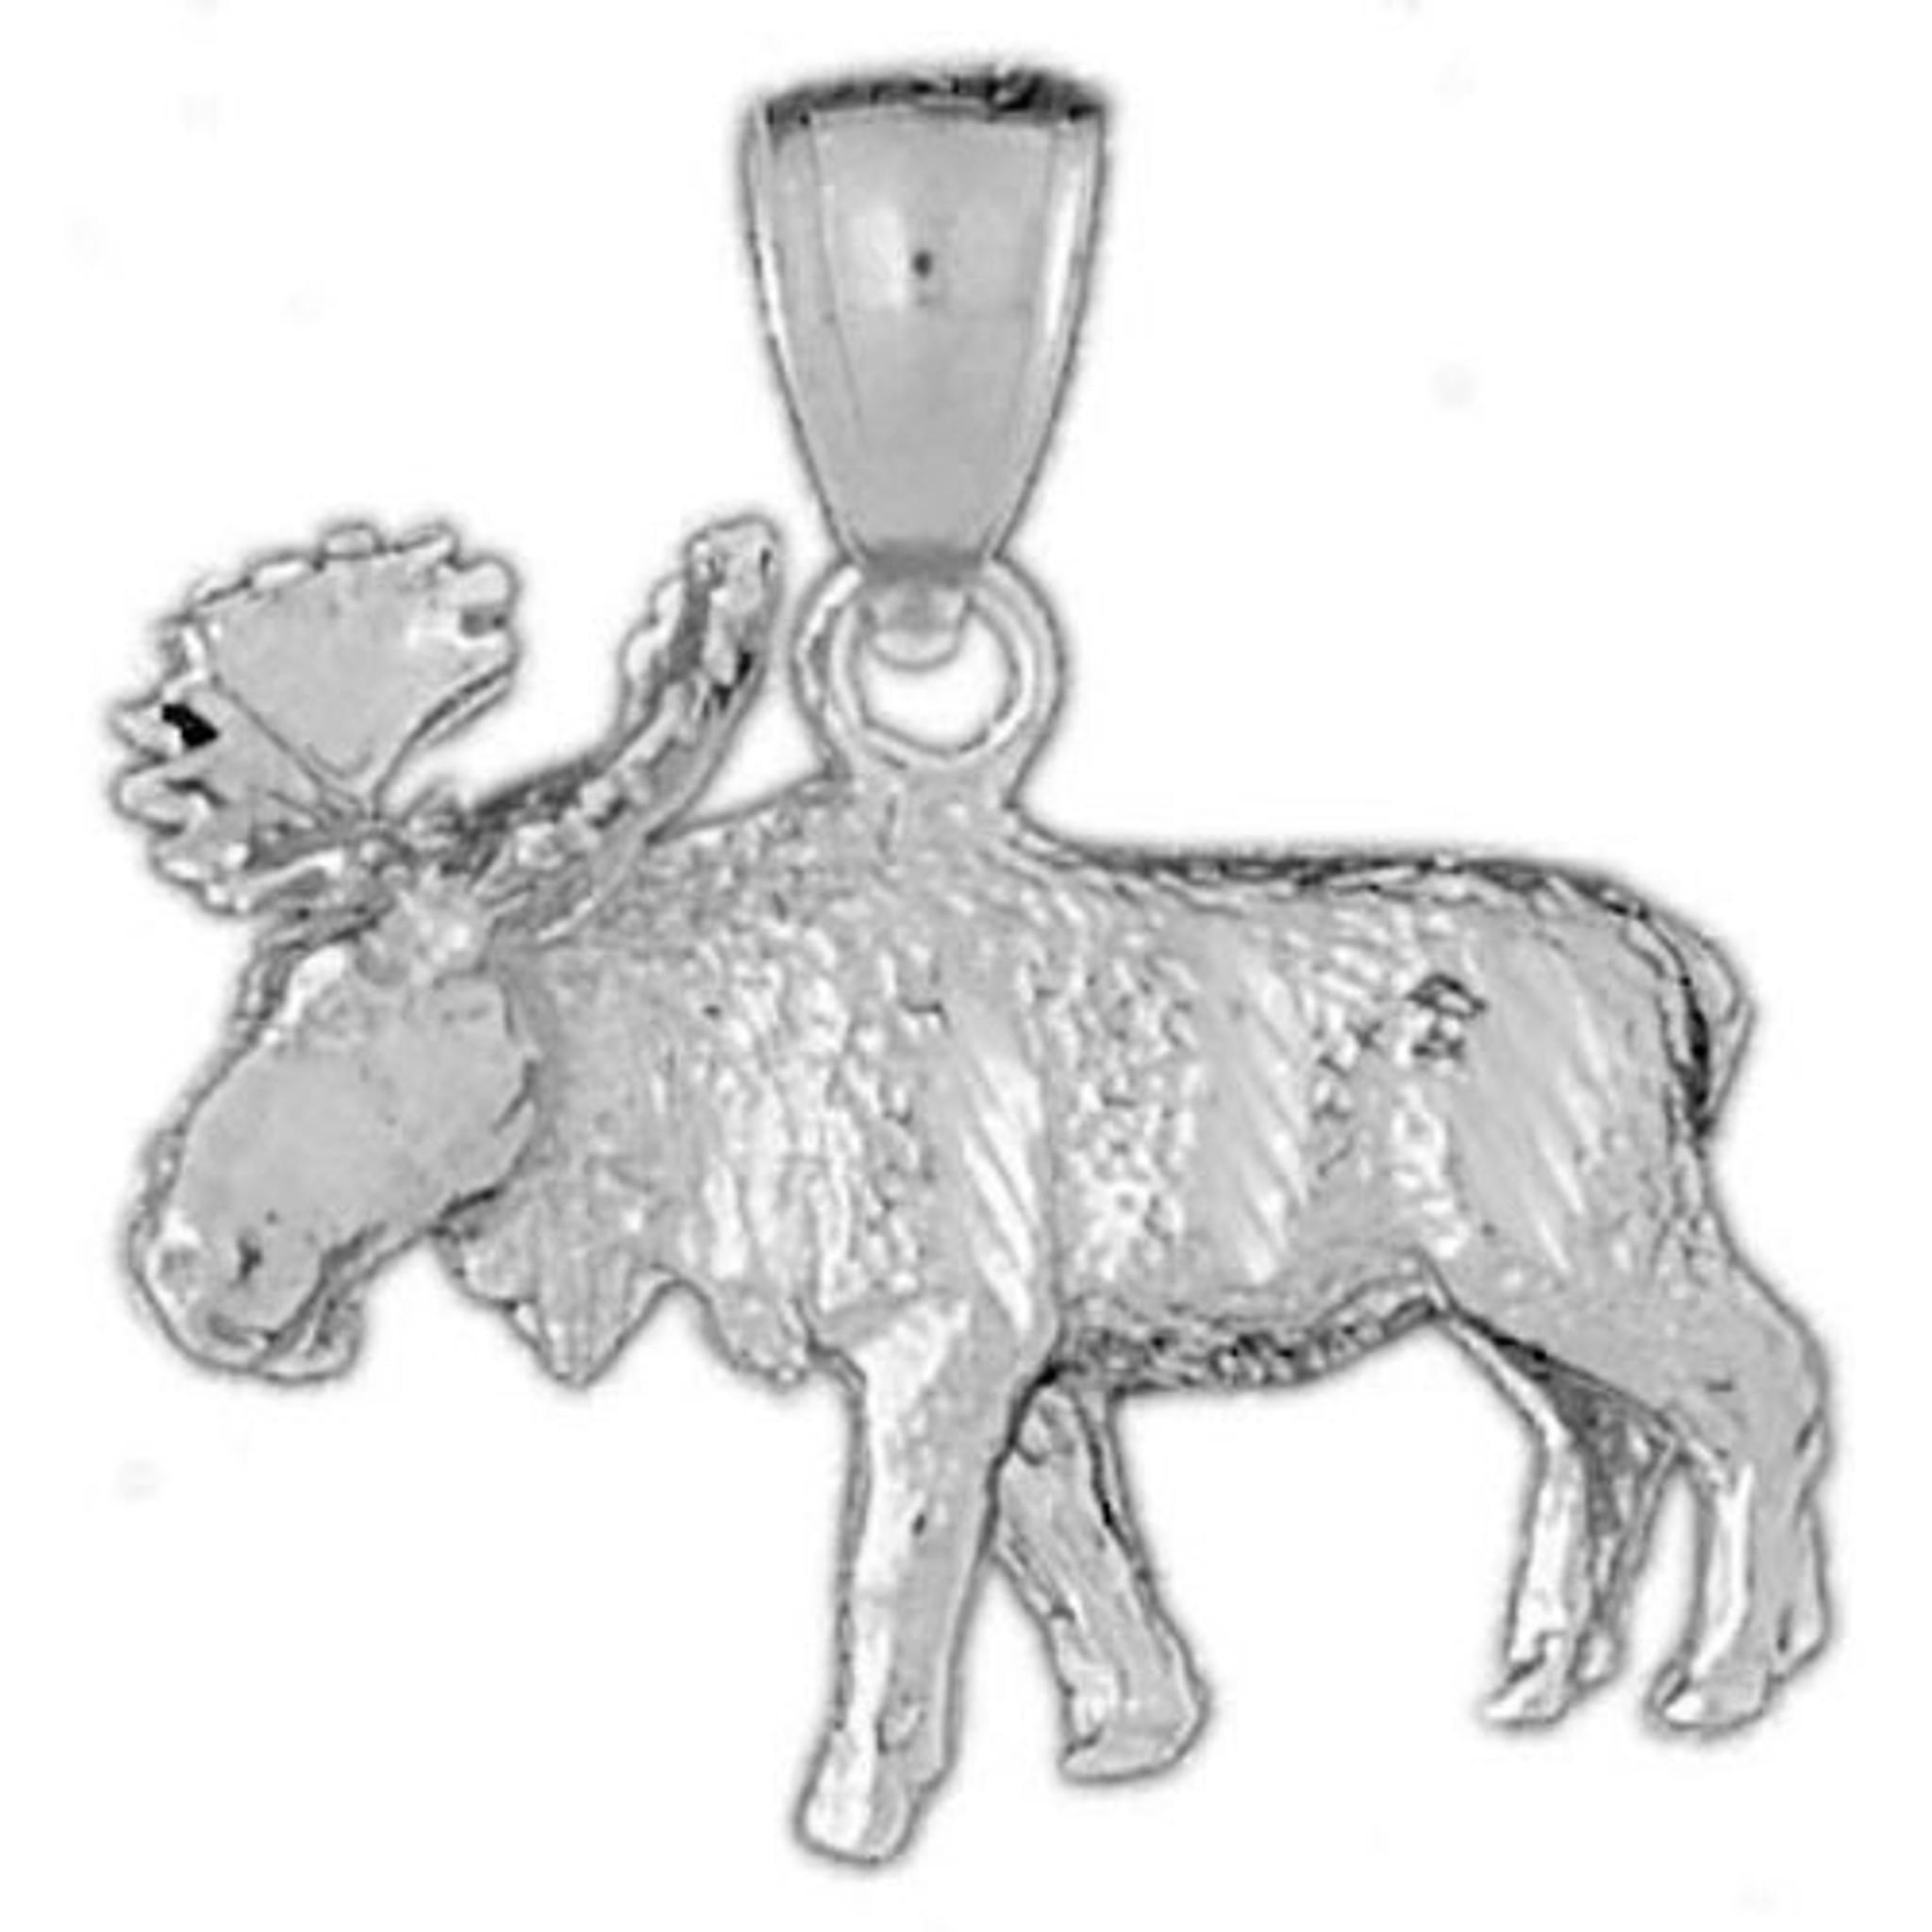 MOOSE ELK DEER .925 Solid Sterling Silver Charm Pendant MADE IN USA